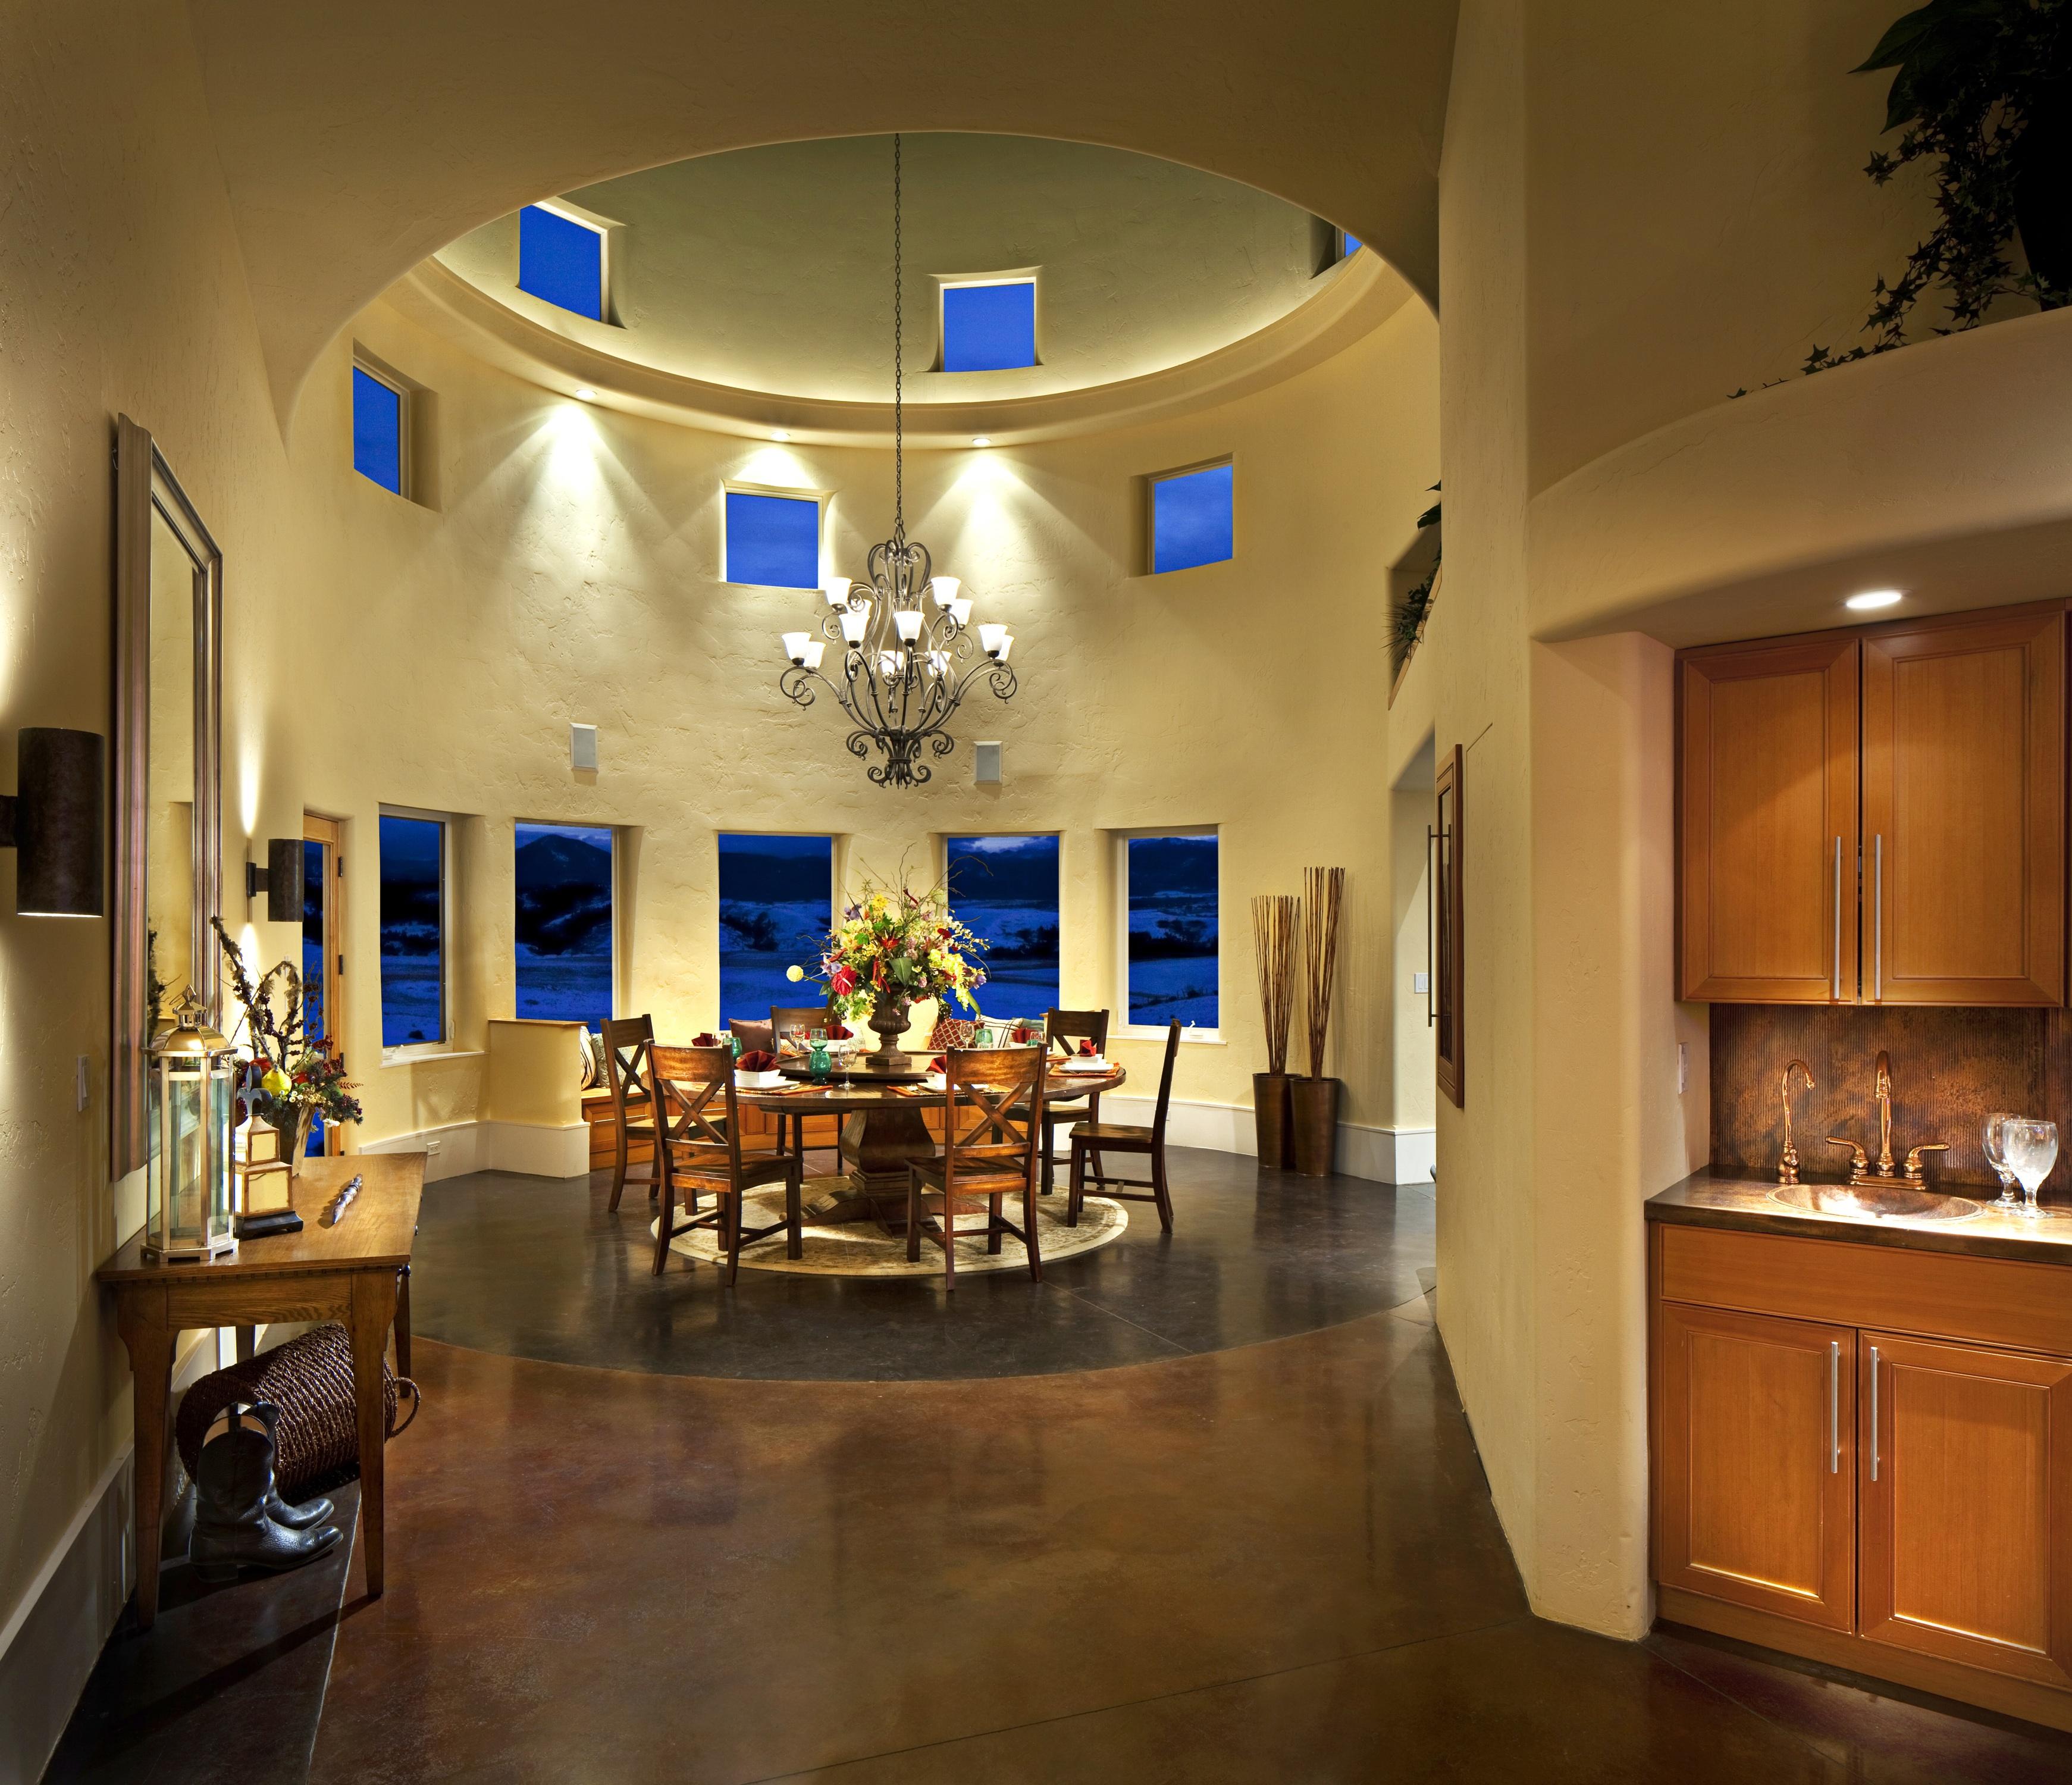 grand estates auction offering stunning bozeman montana 20 acre